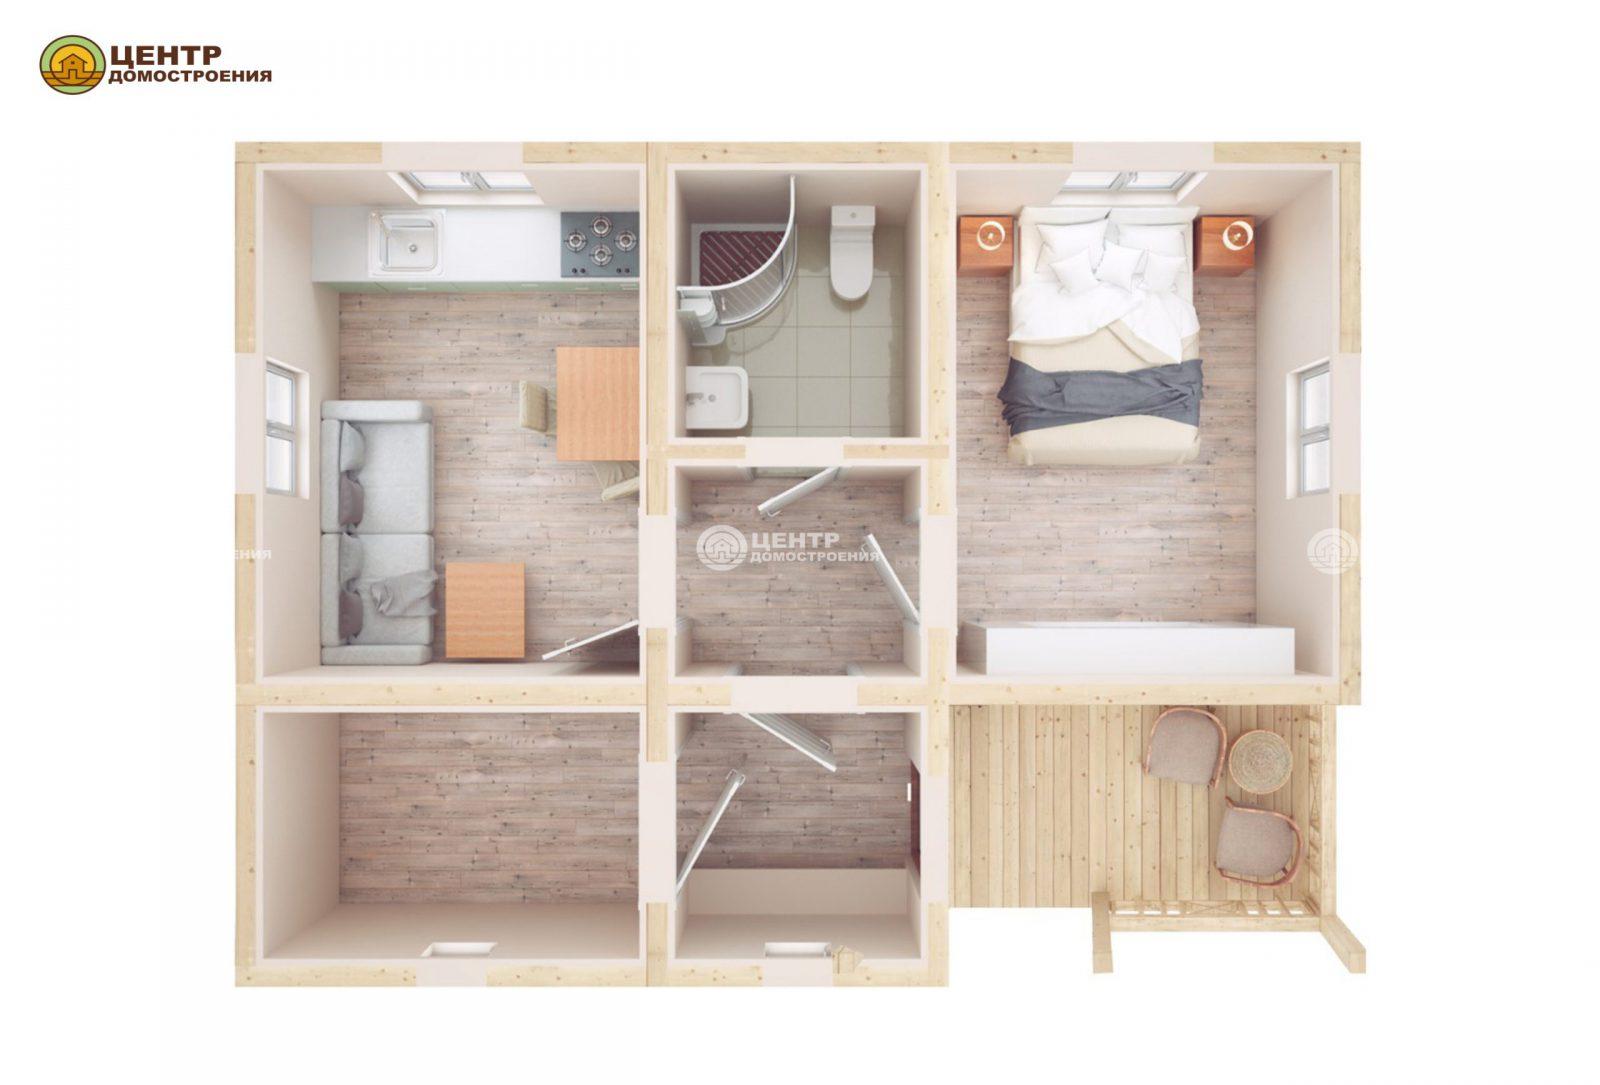 Проект одноэтажного дома 8 на 6